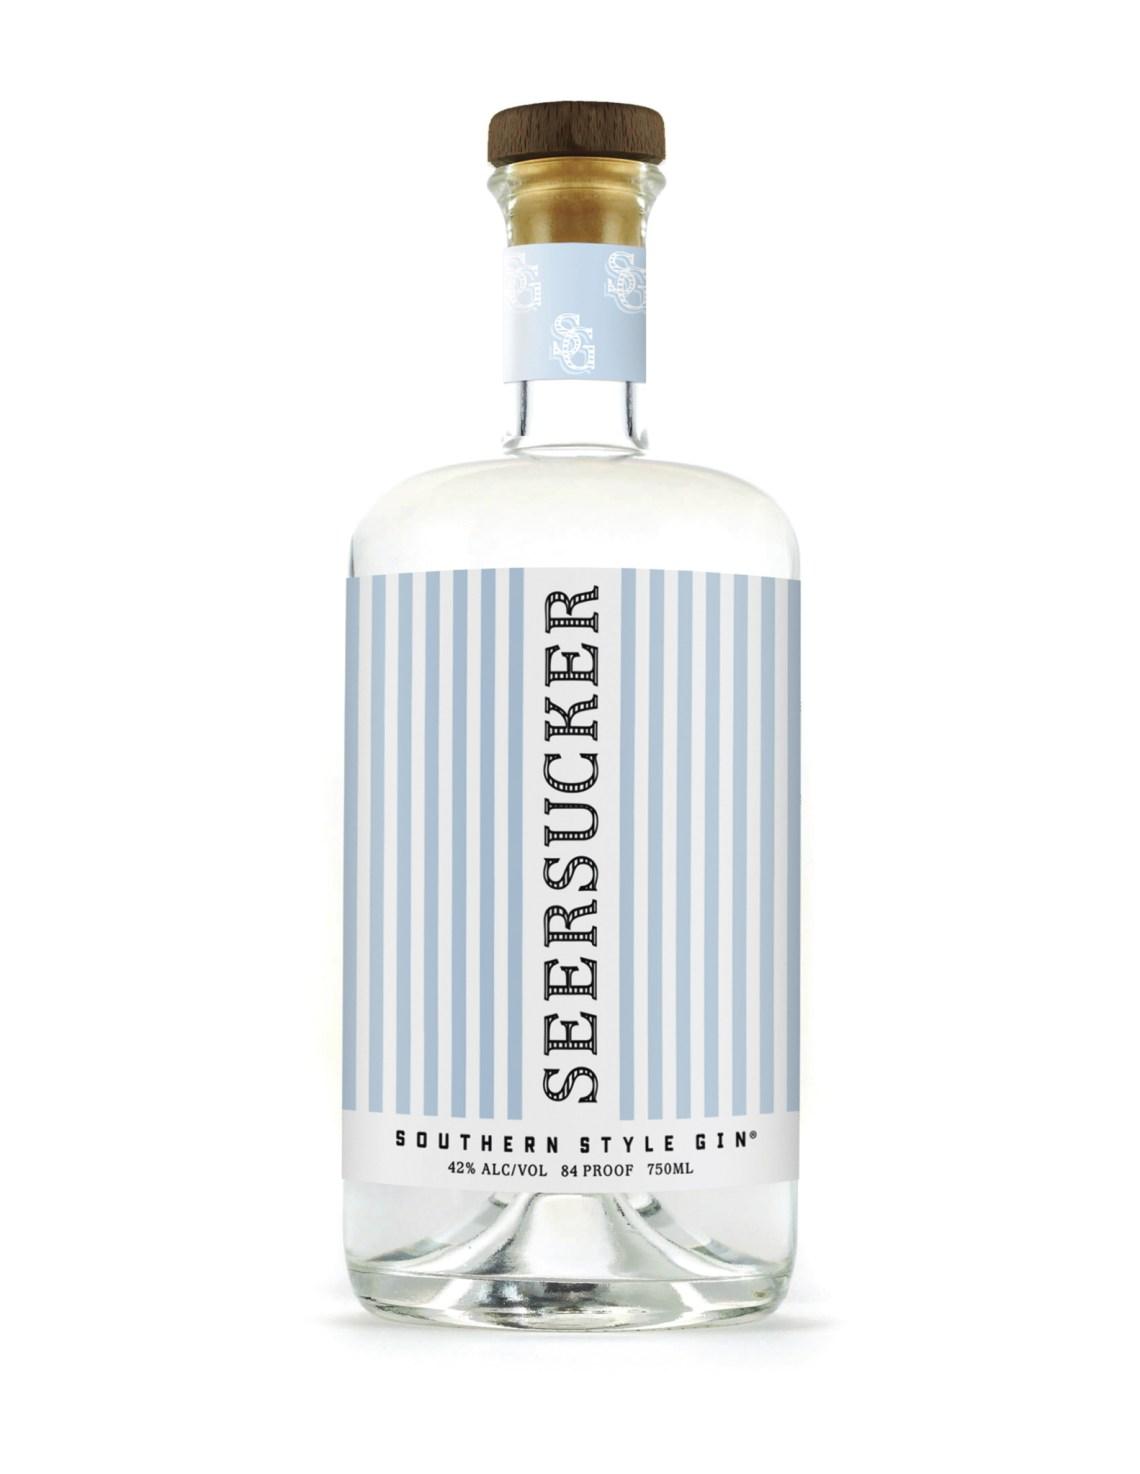 Seersucker Southern Style Gin